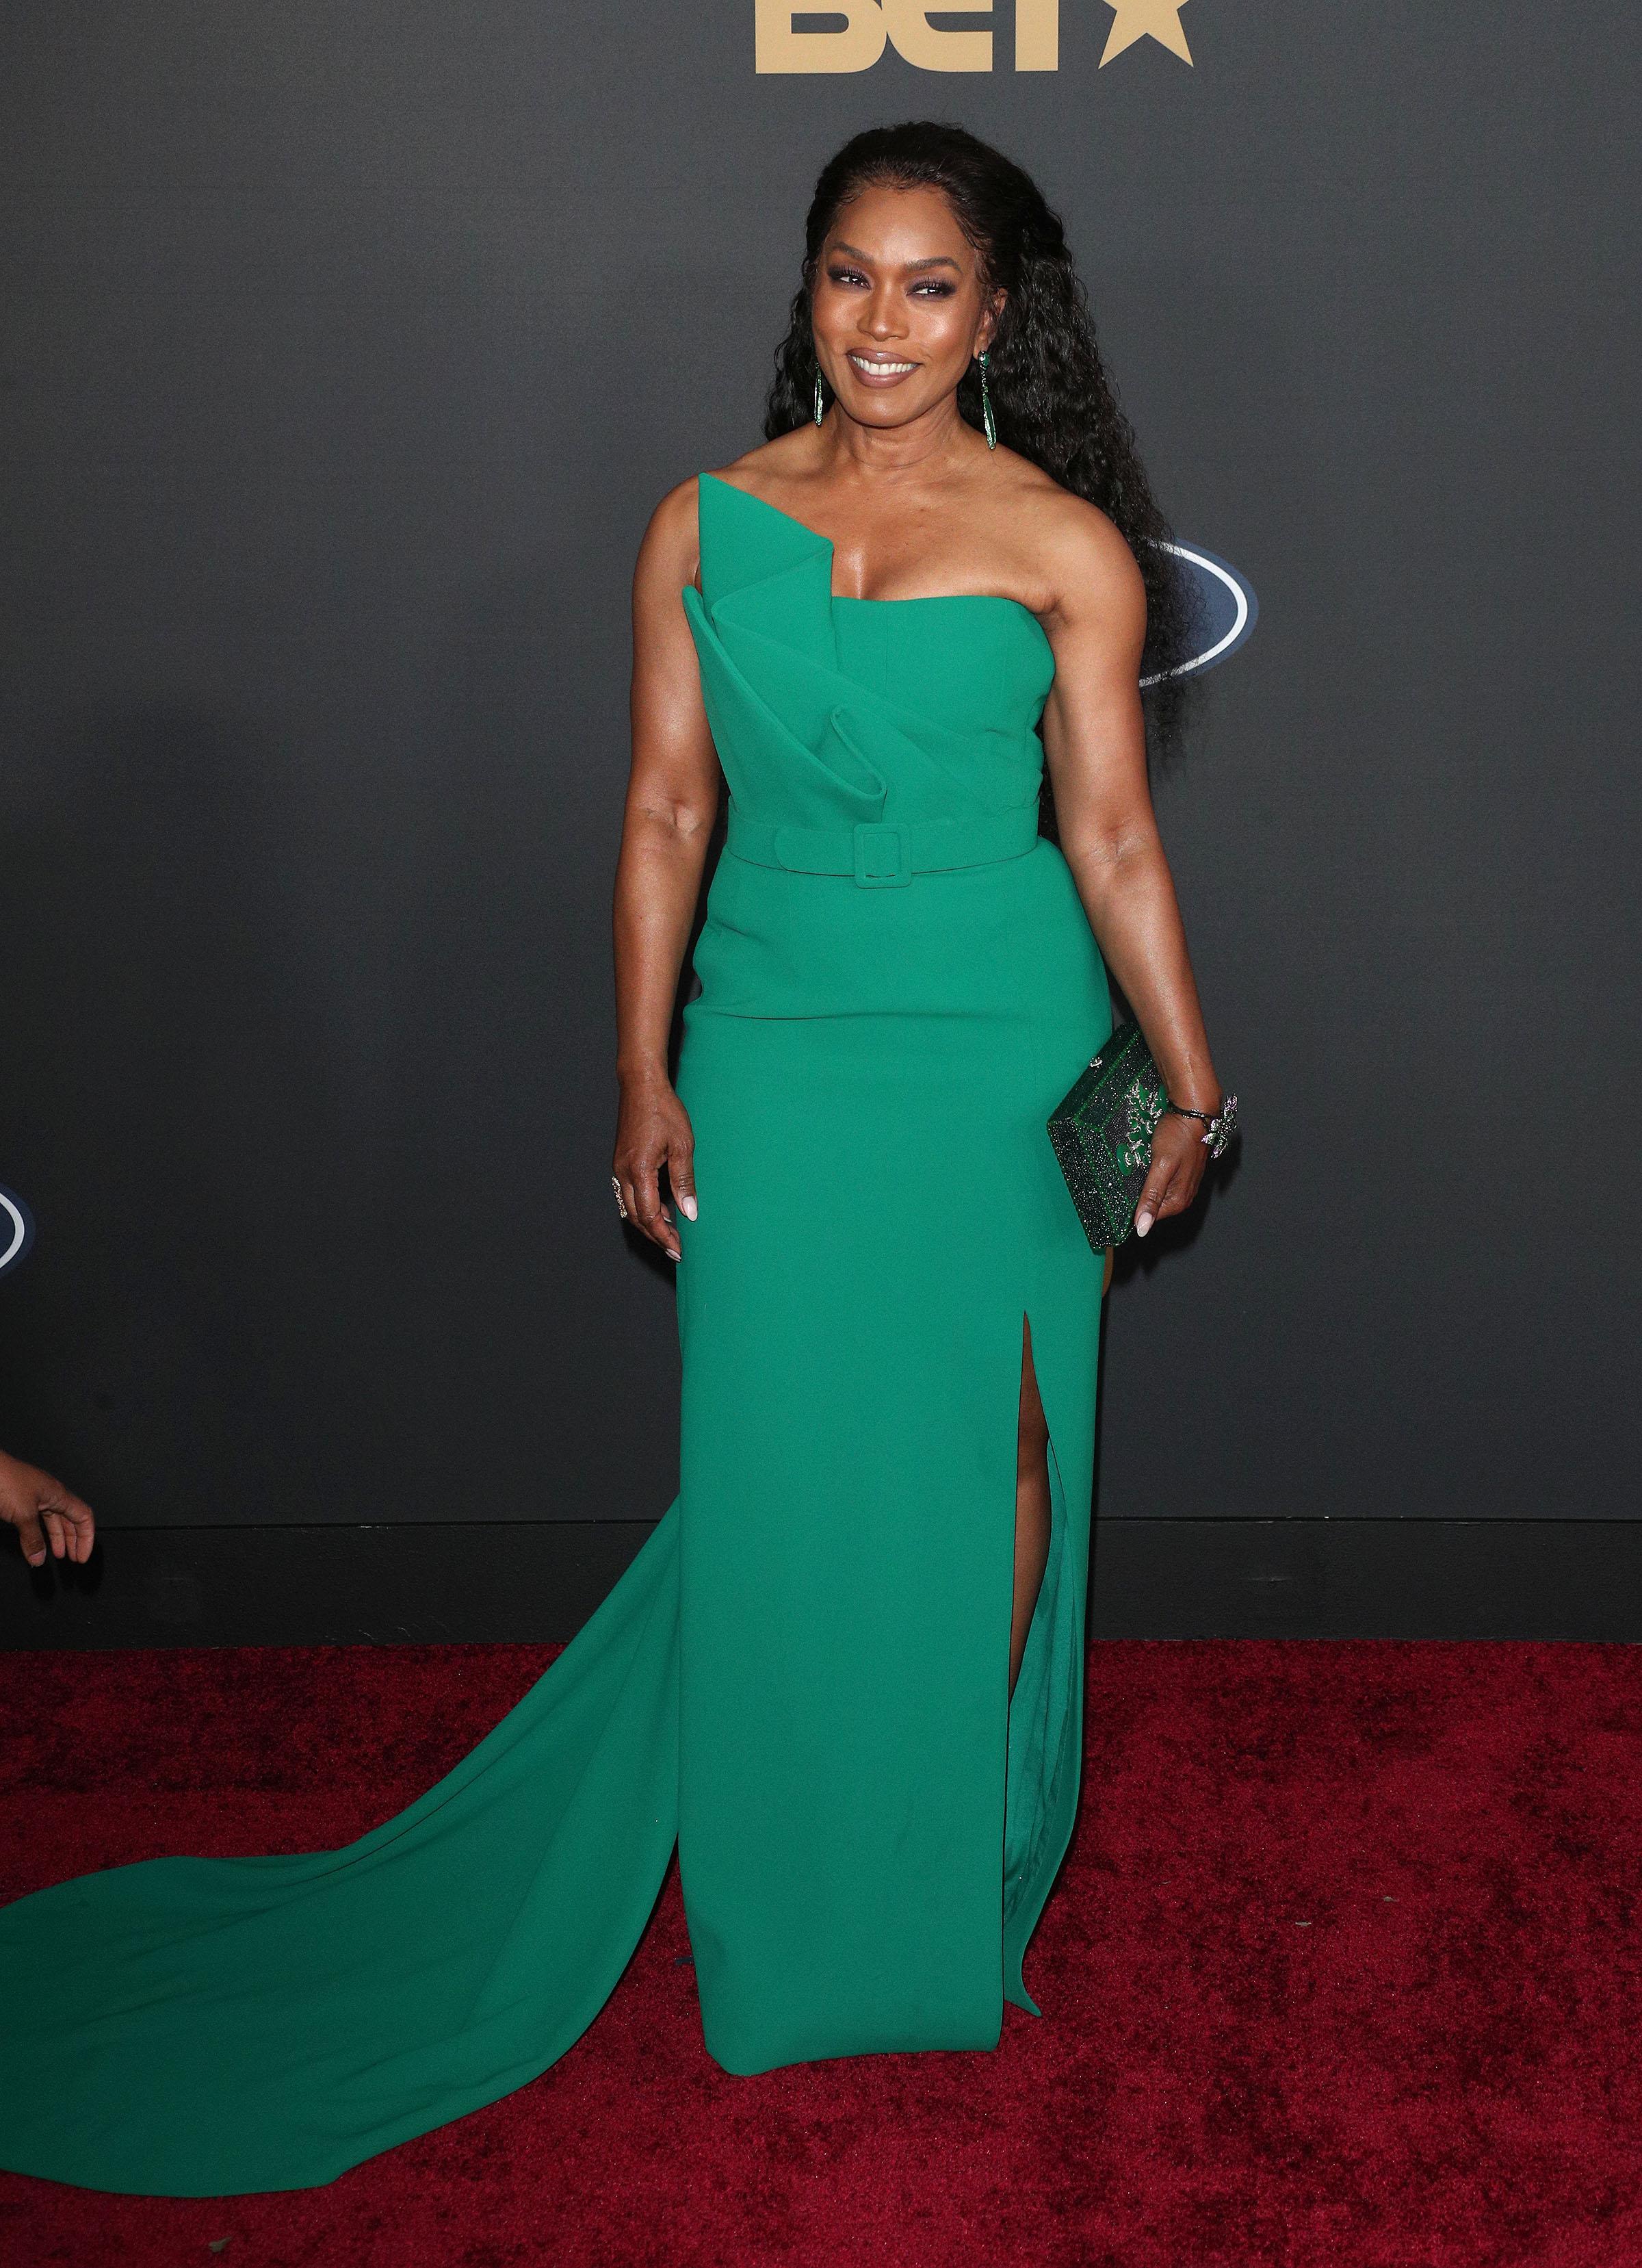 Angela Bassett at The 51st NAACP Image Awards